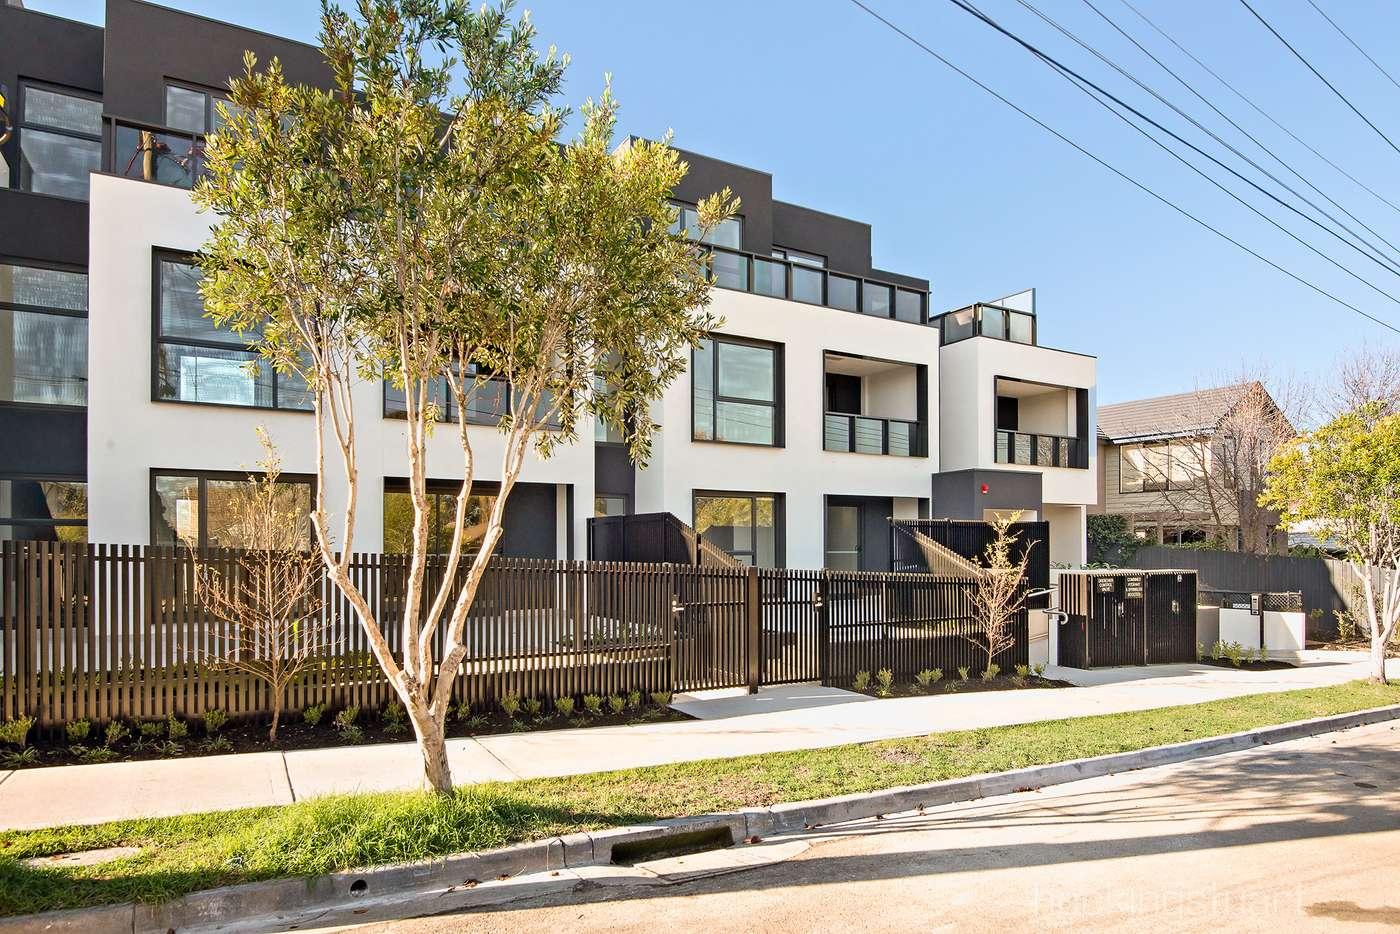 Main view of Homely apartment listing, 102/10 Major Street, Highett VIC 3190